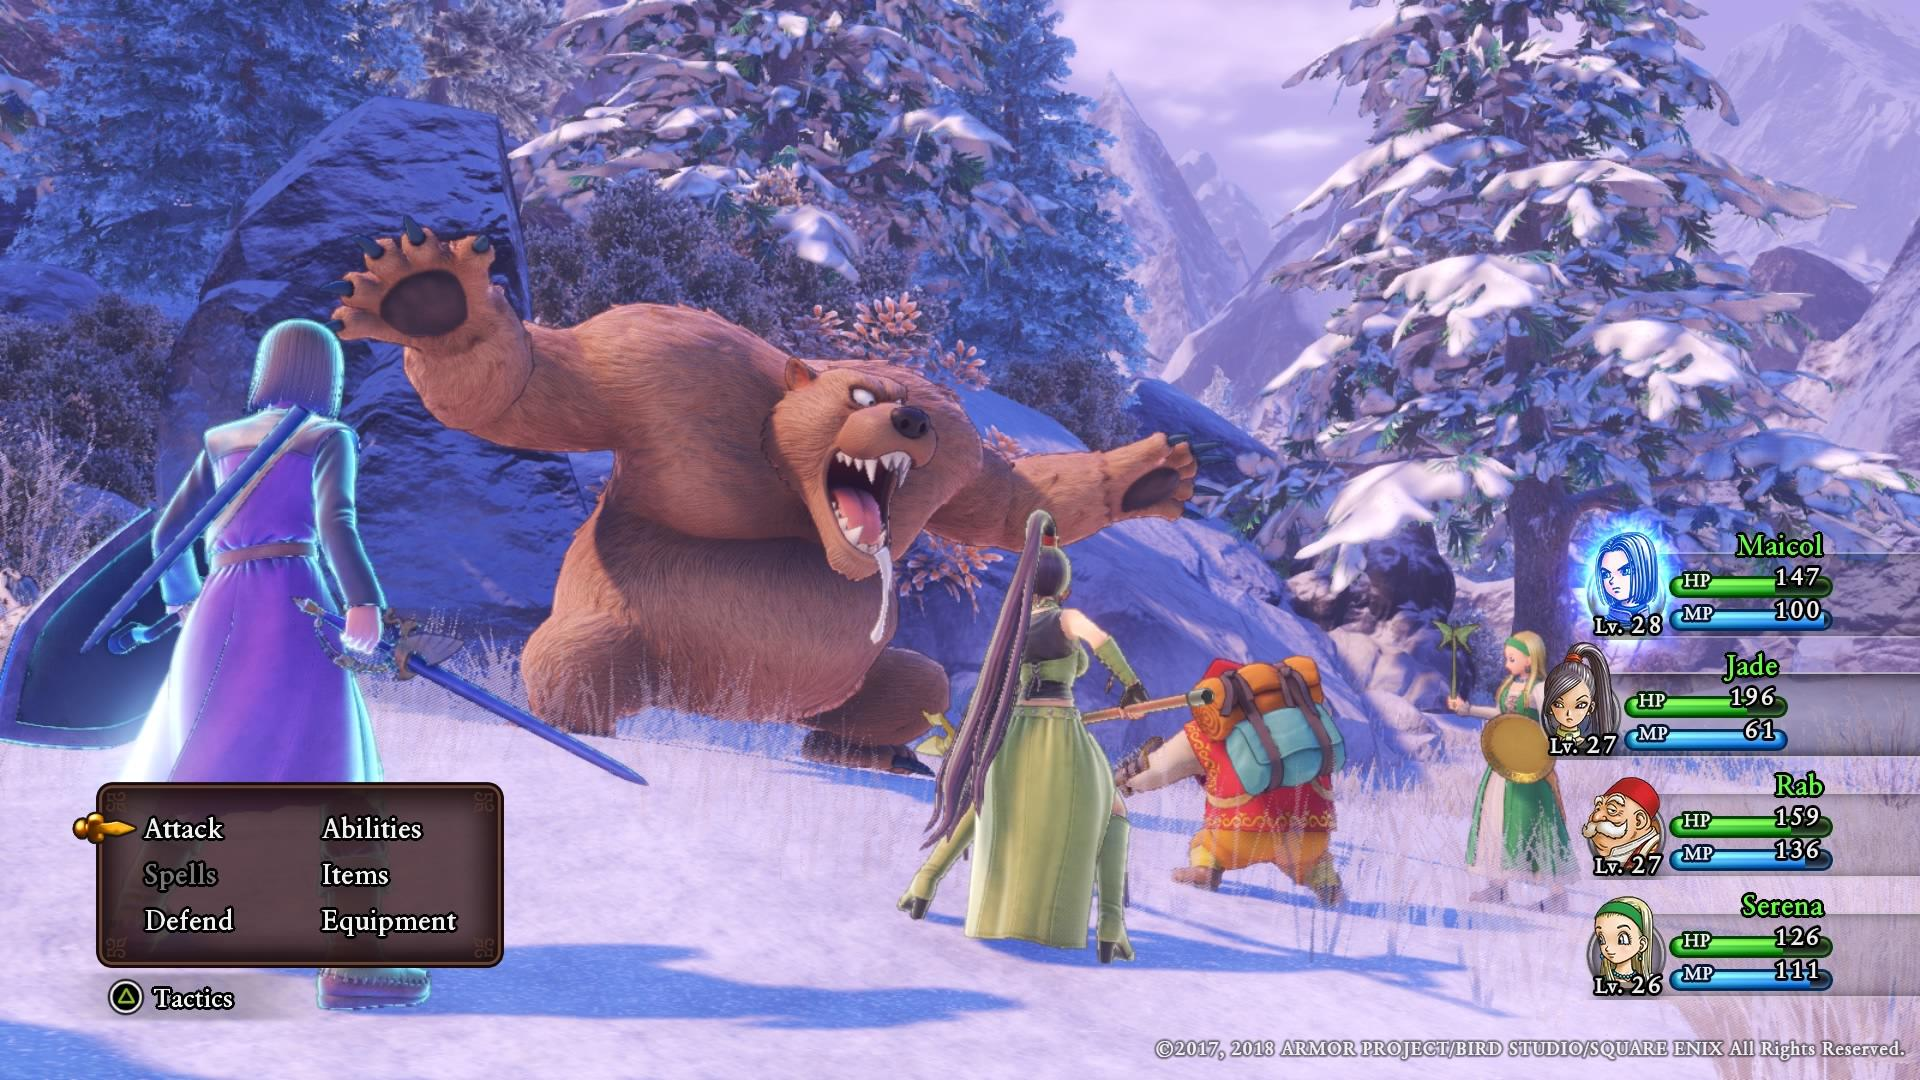 dragon-quest-xi-echoes-of-an-elusive-age-pc-screenshot-4